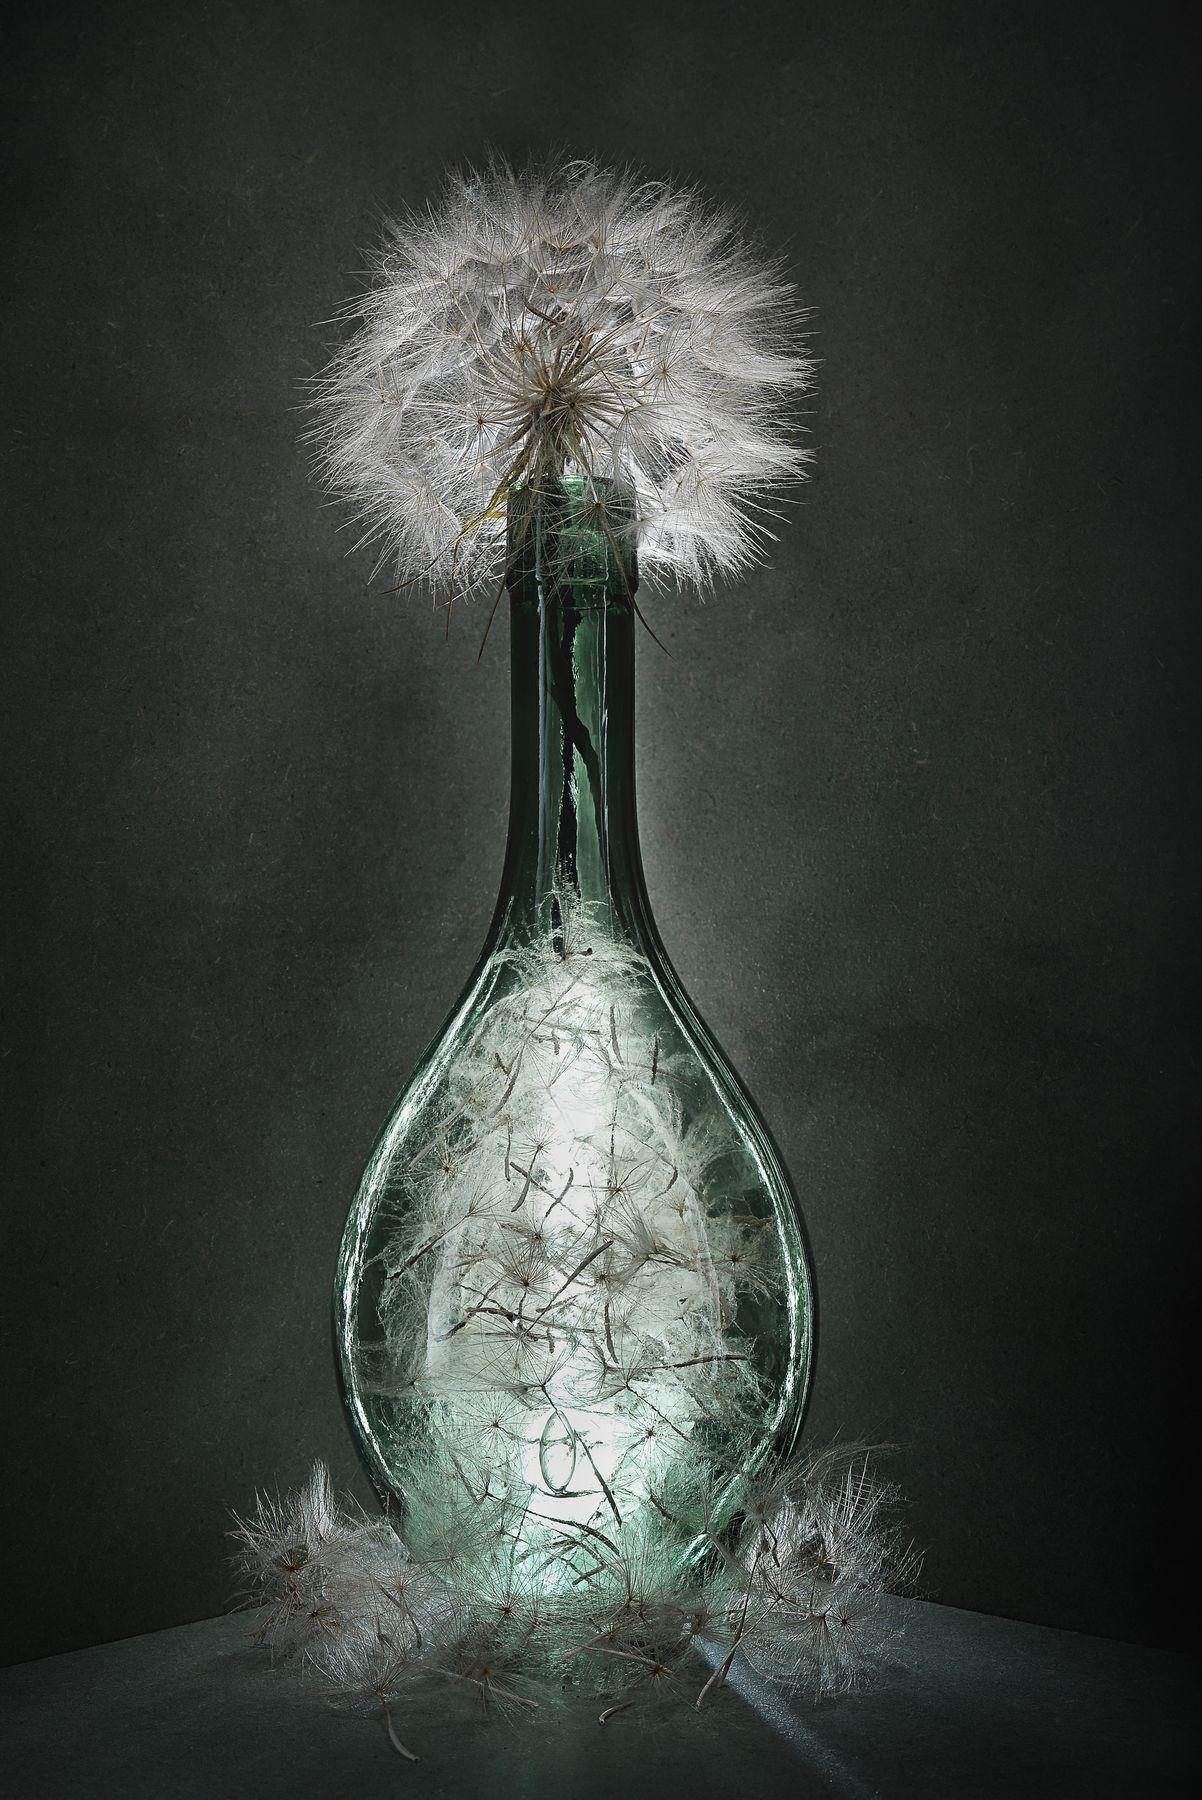 Вино из одуванчиков 1. Натюрморт стекло на просвет одуванчики низкий ключ